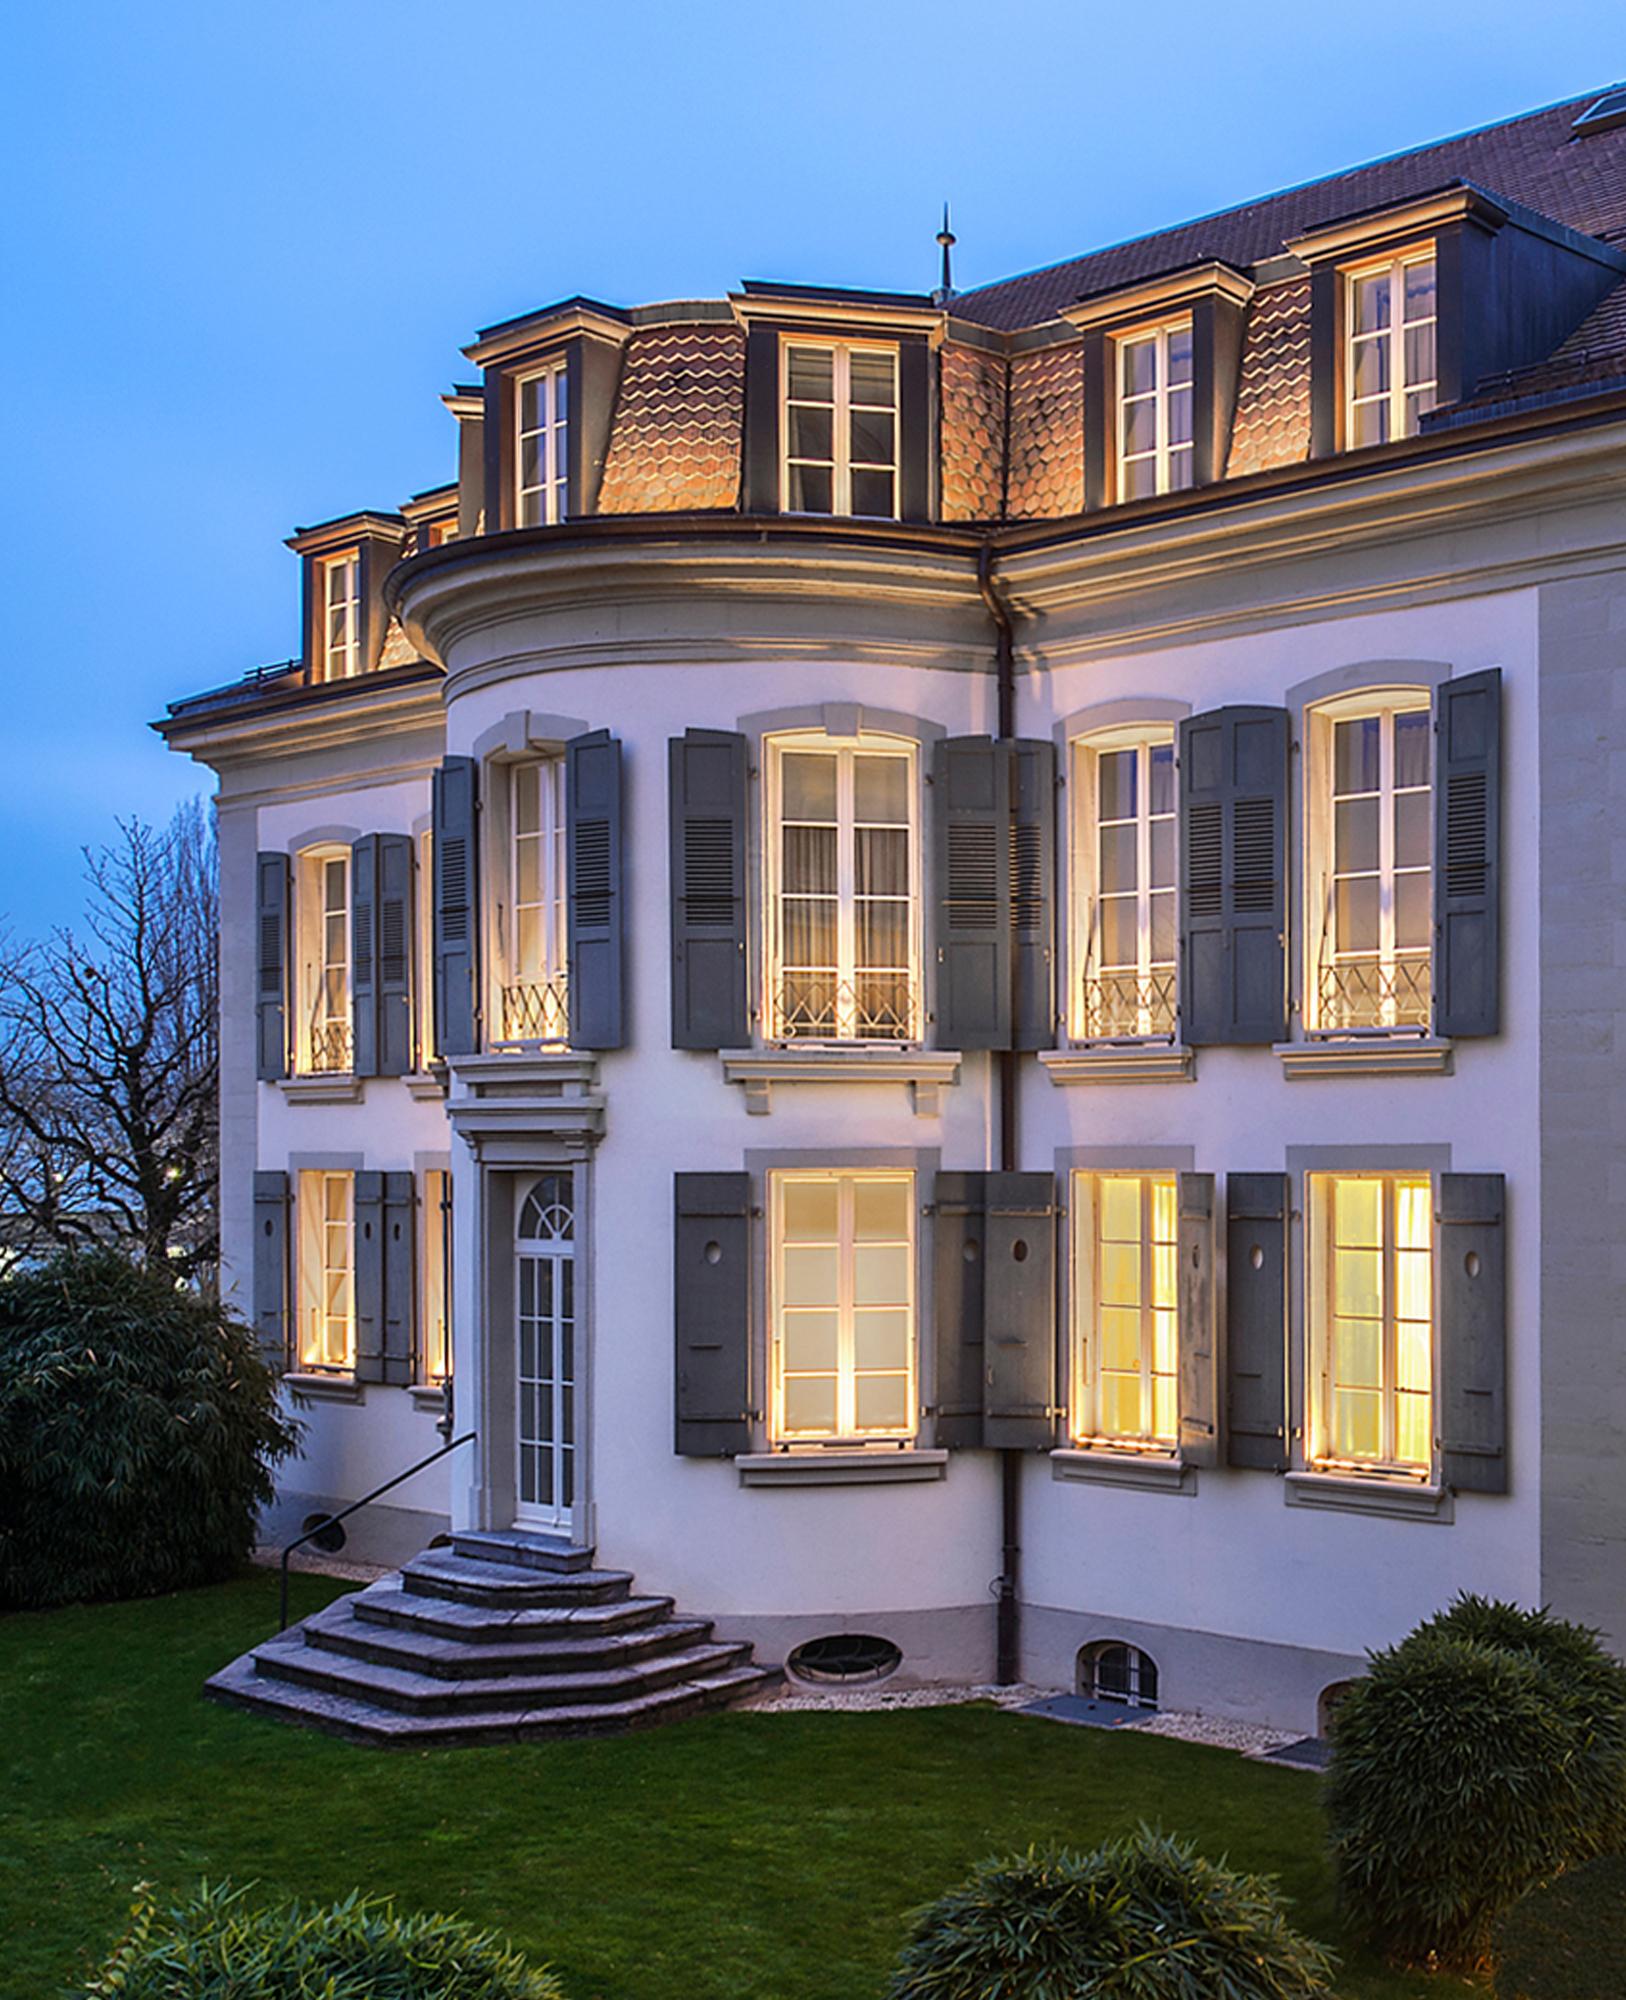 Hôtel Angleterre & Résidence WNG Agence Digitale